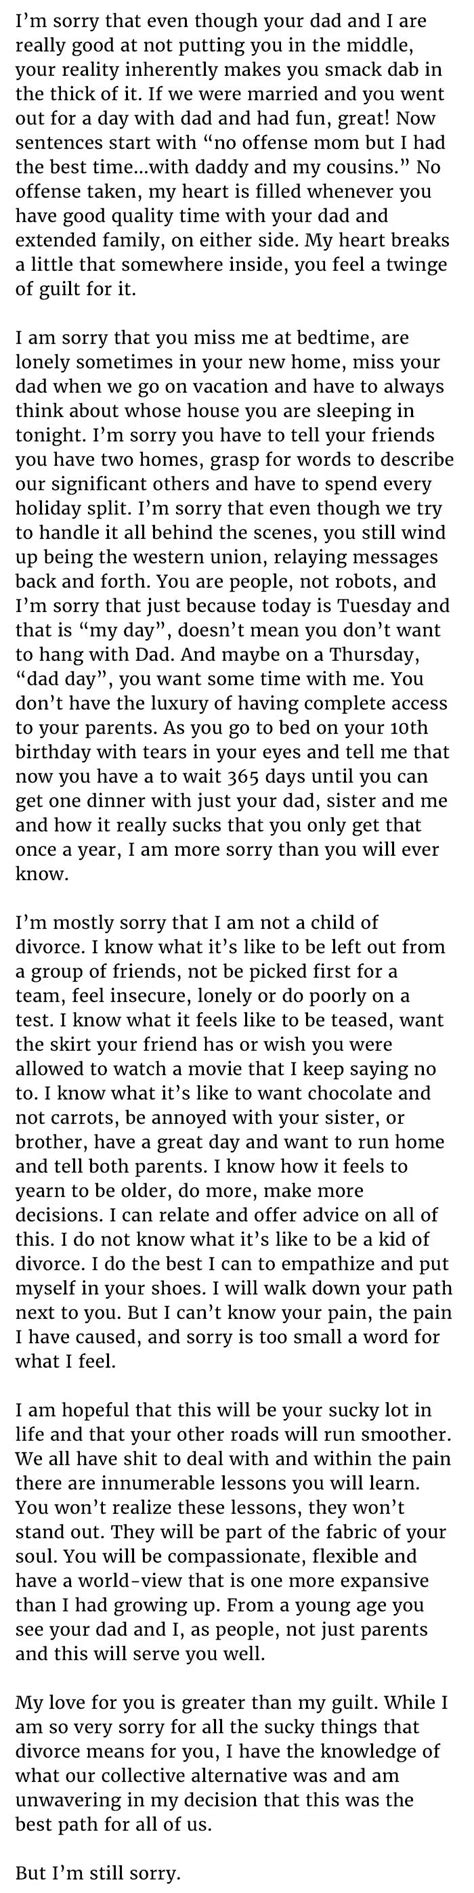 Ultimate Divorce Letter awesome quotes best divorce letter awesome quotes best divorce letter best divorce